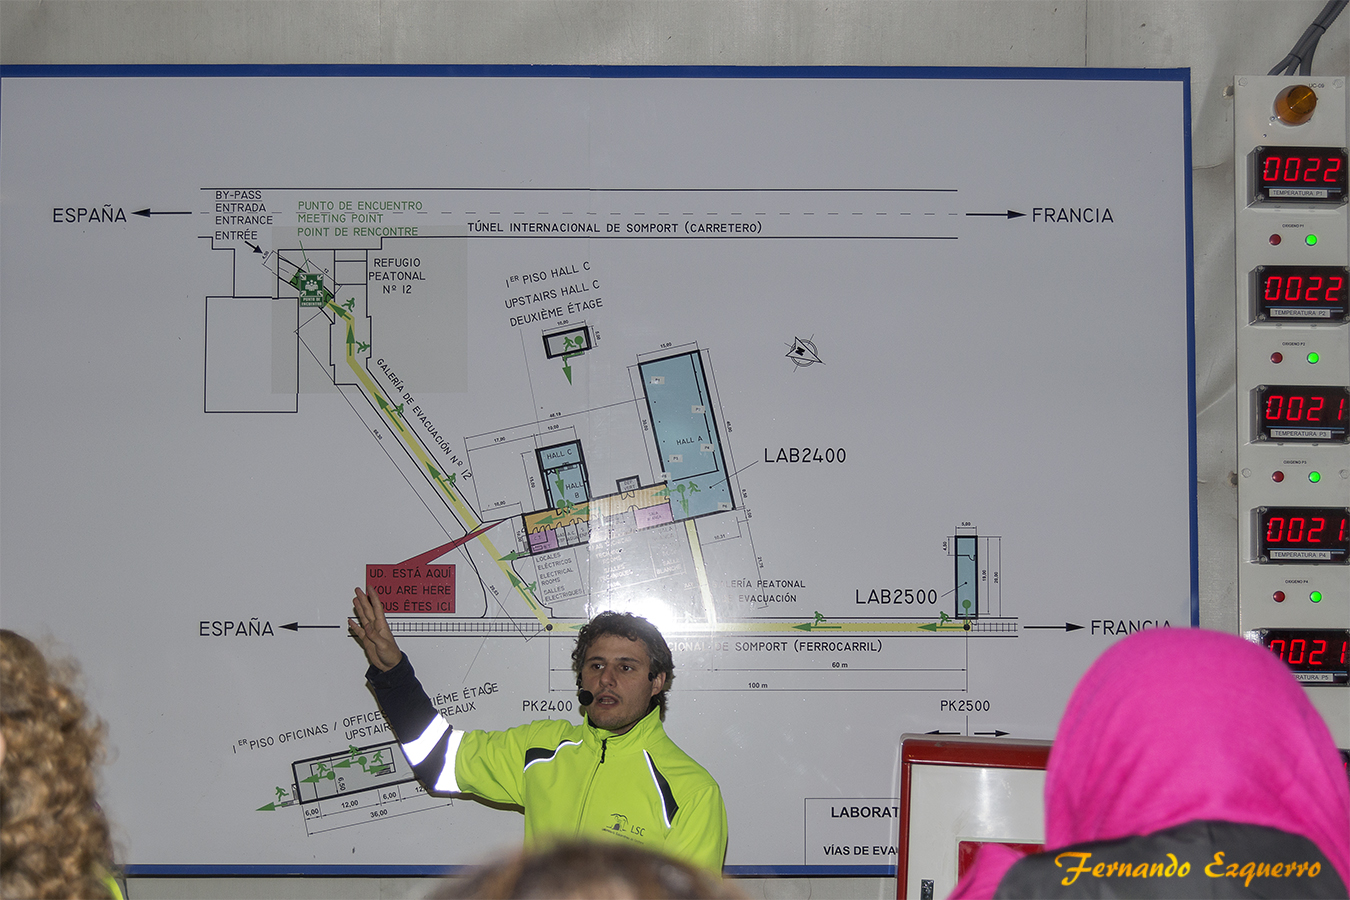 Laboratorio subterraneo de Canfranc